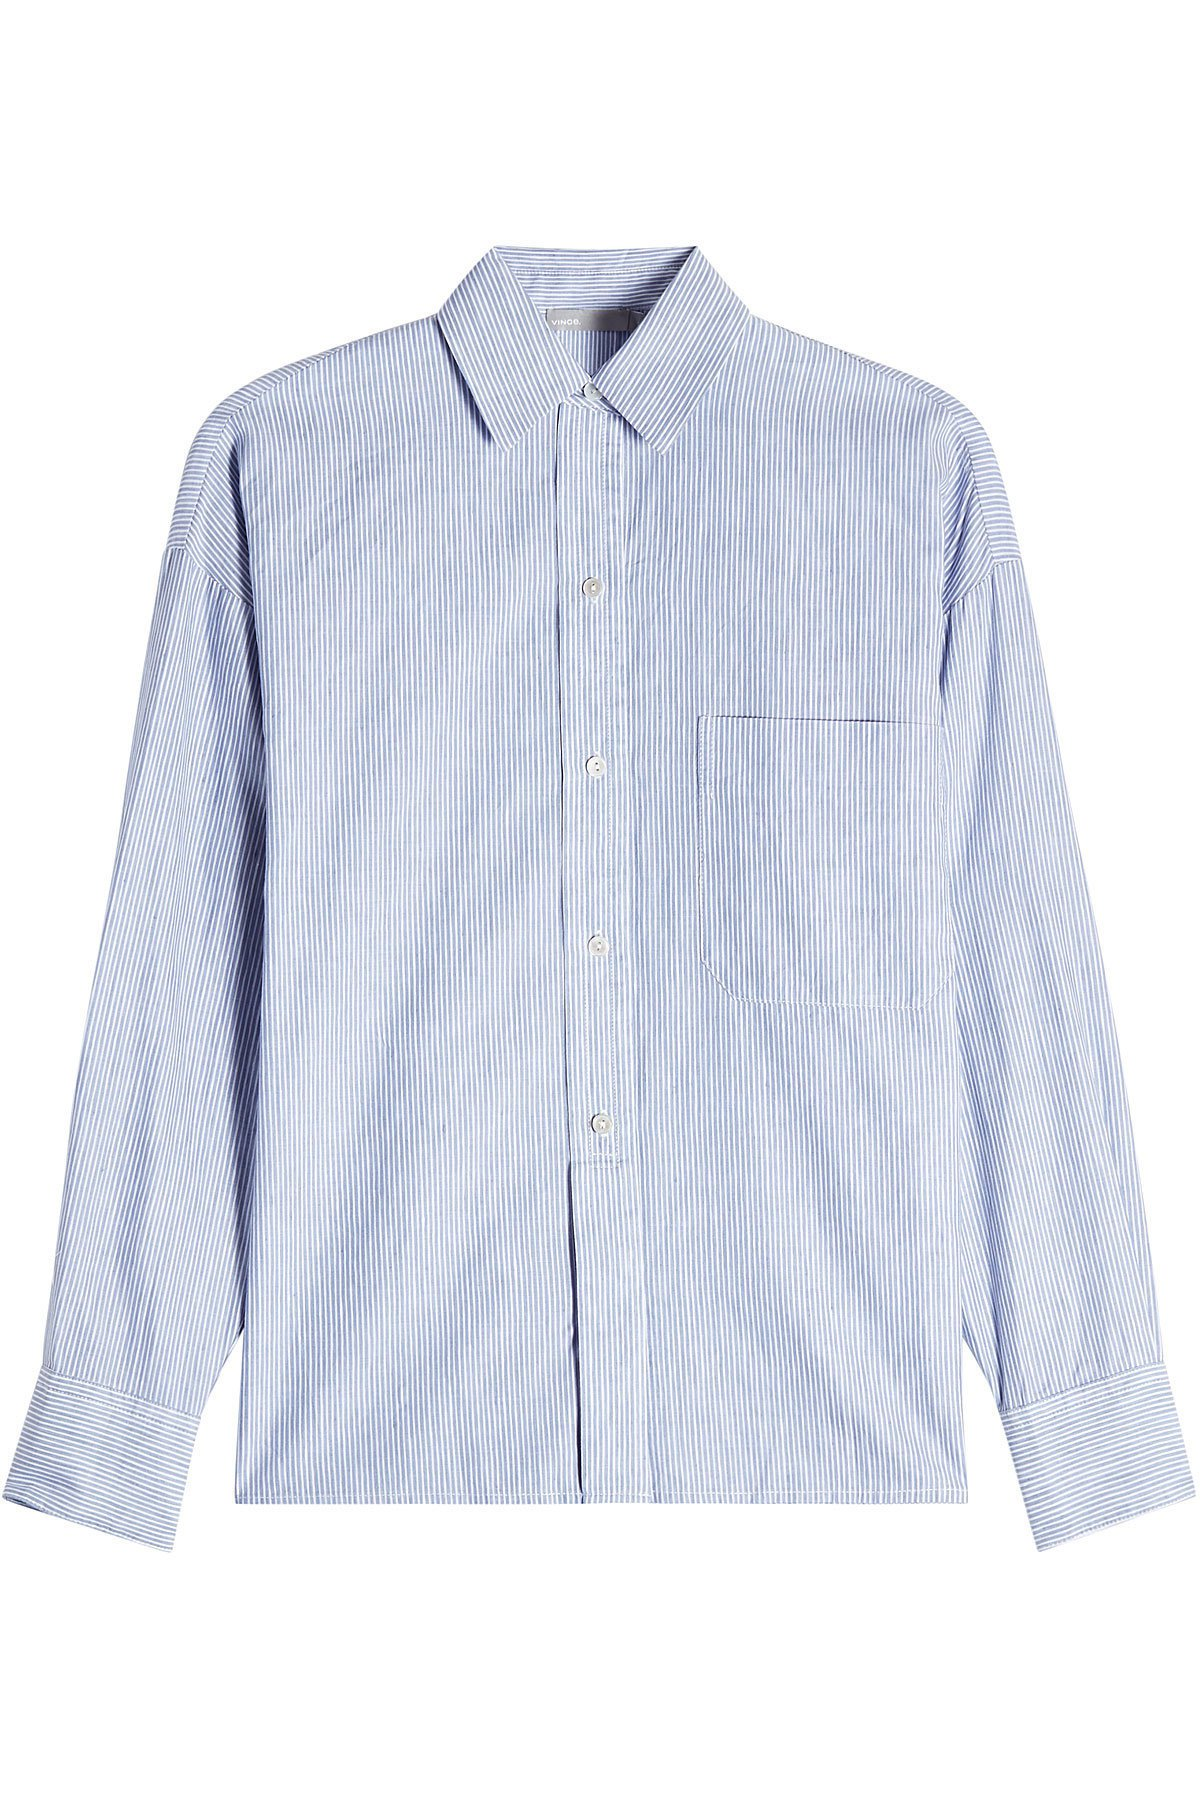 Striped Linen Shirt with Cotton Gr. M